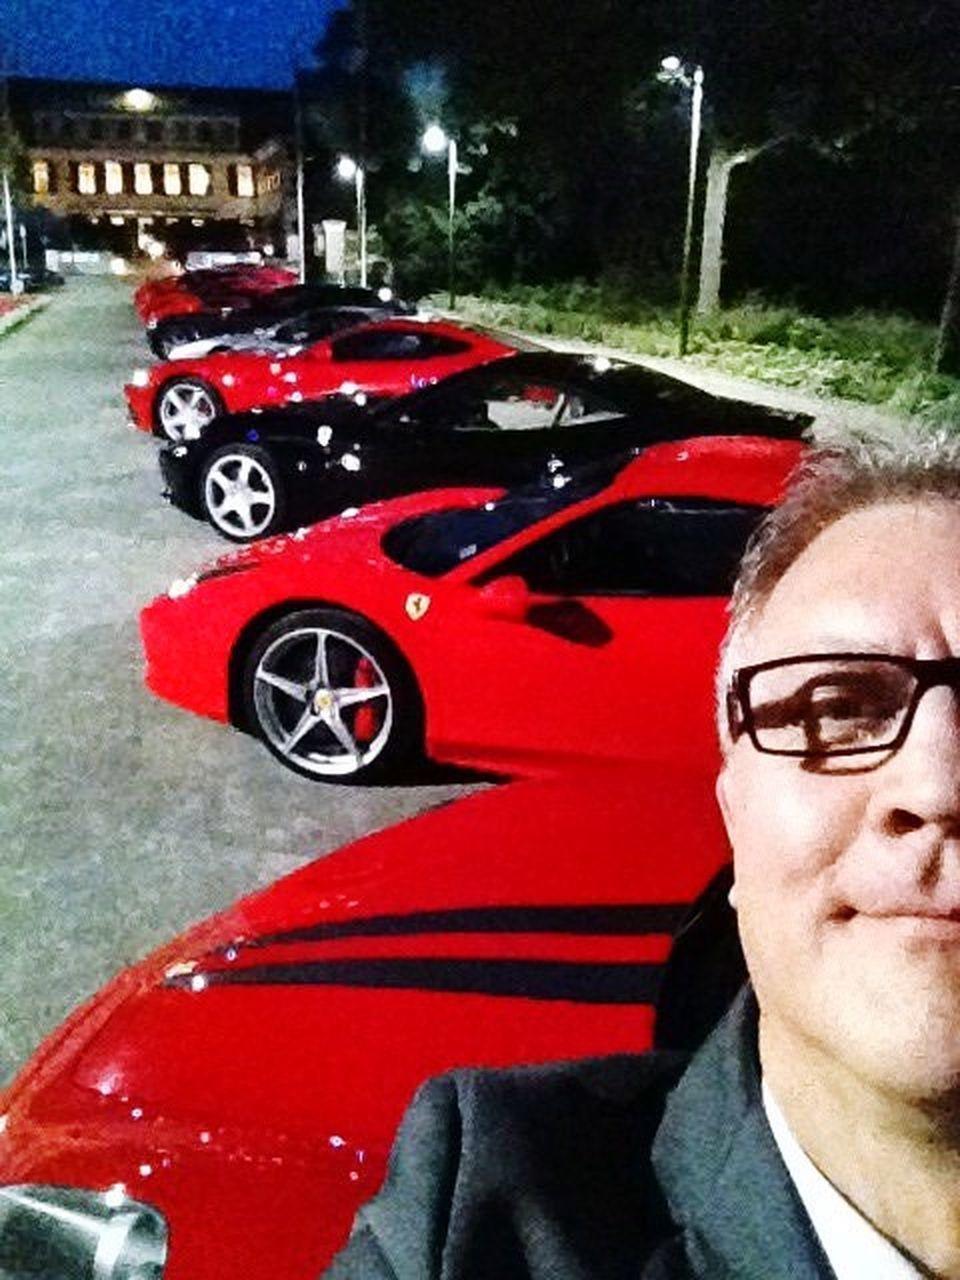 PORTRAIT OF MAN WEARING RED CAR